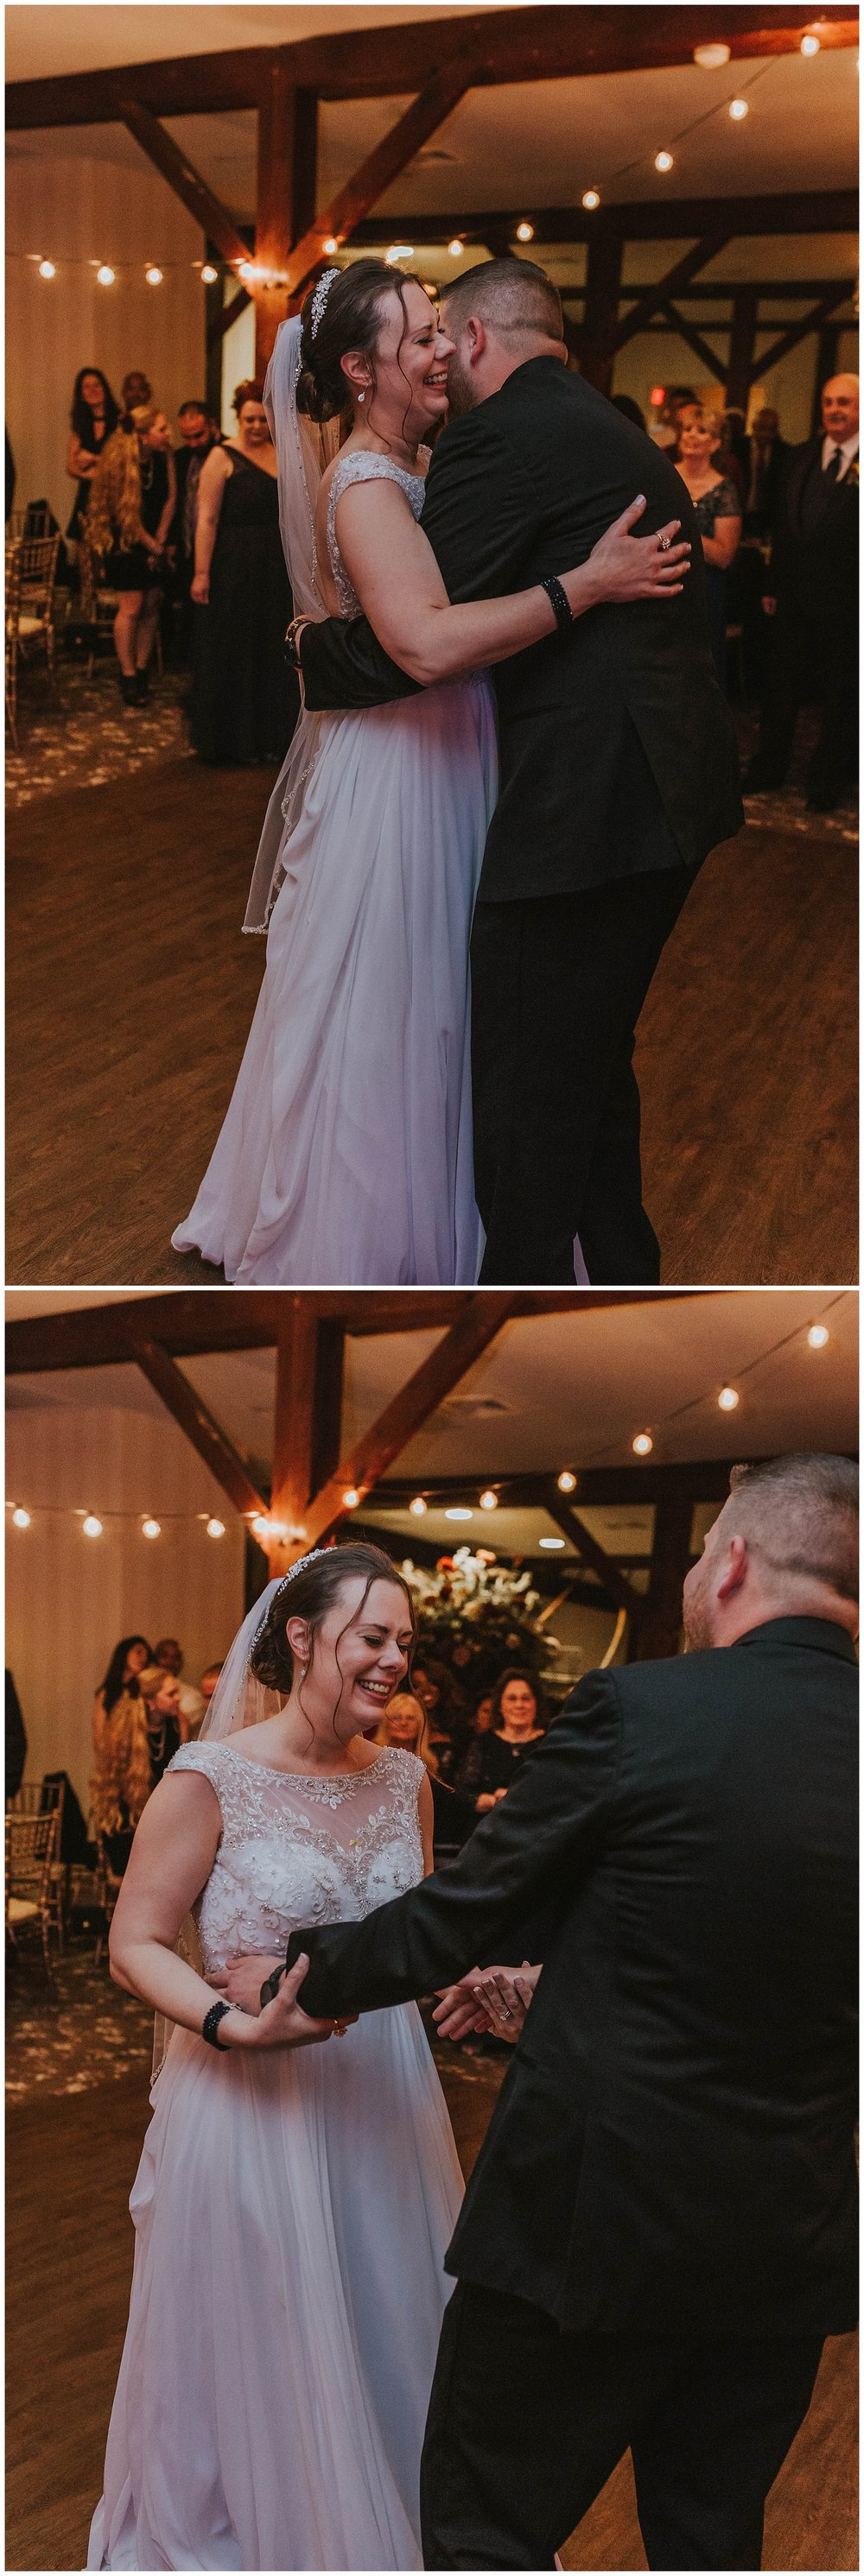 Winter Wedding at Fox Hollow Golf Club in Branchburg New Jersey_0121.jpg